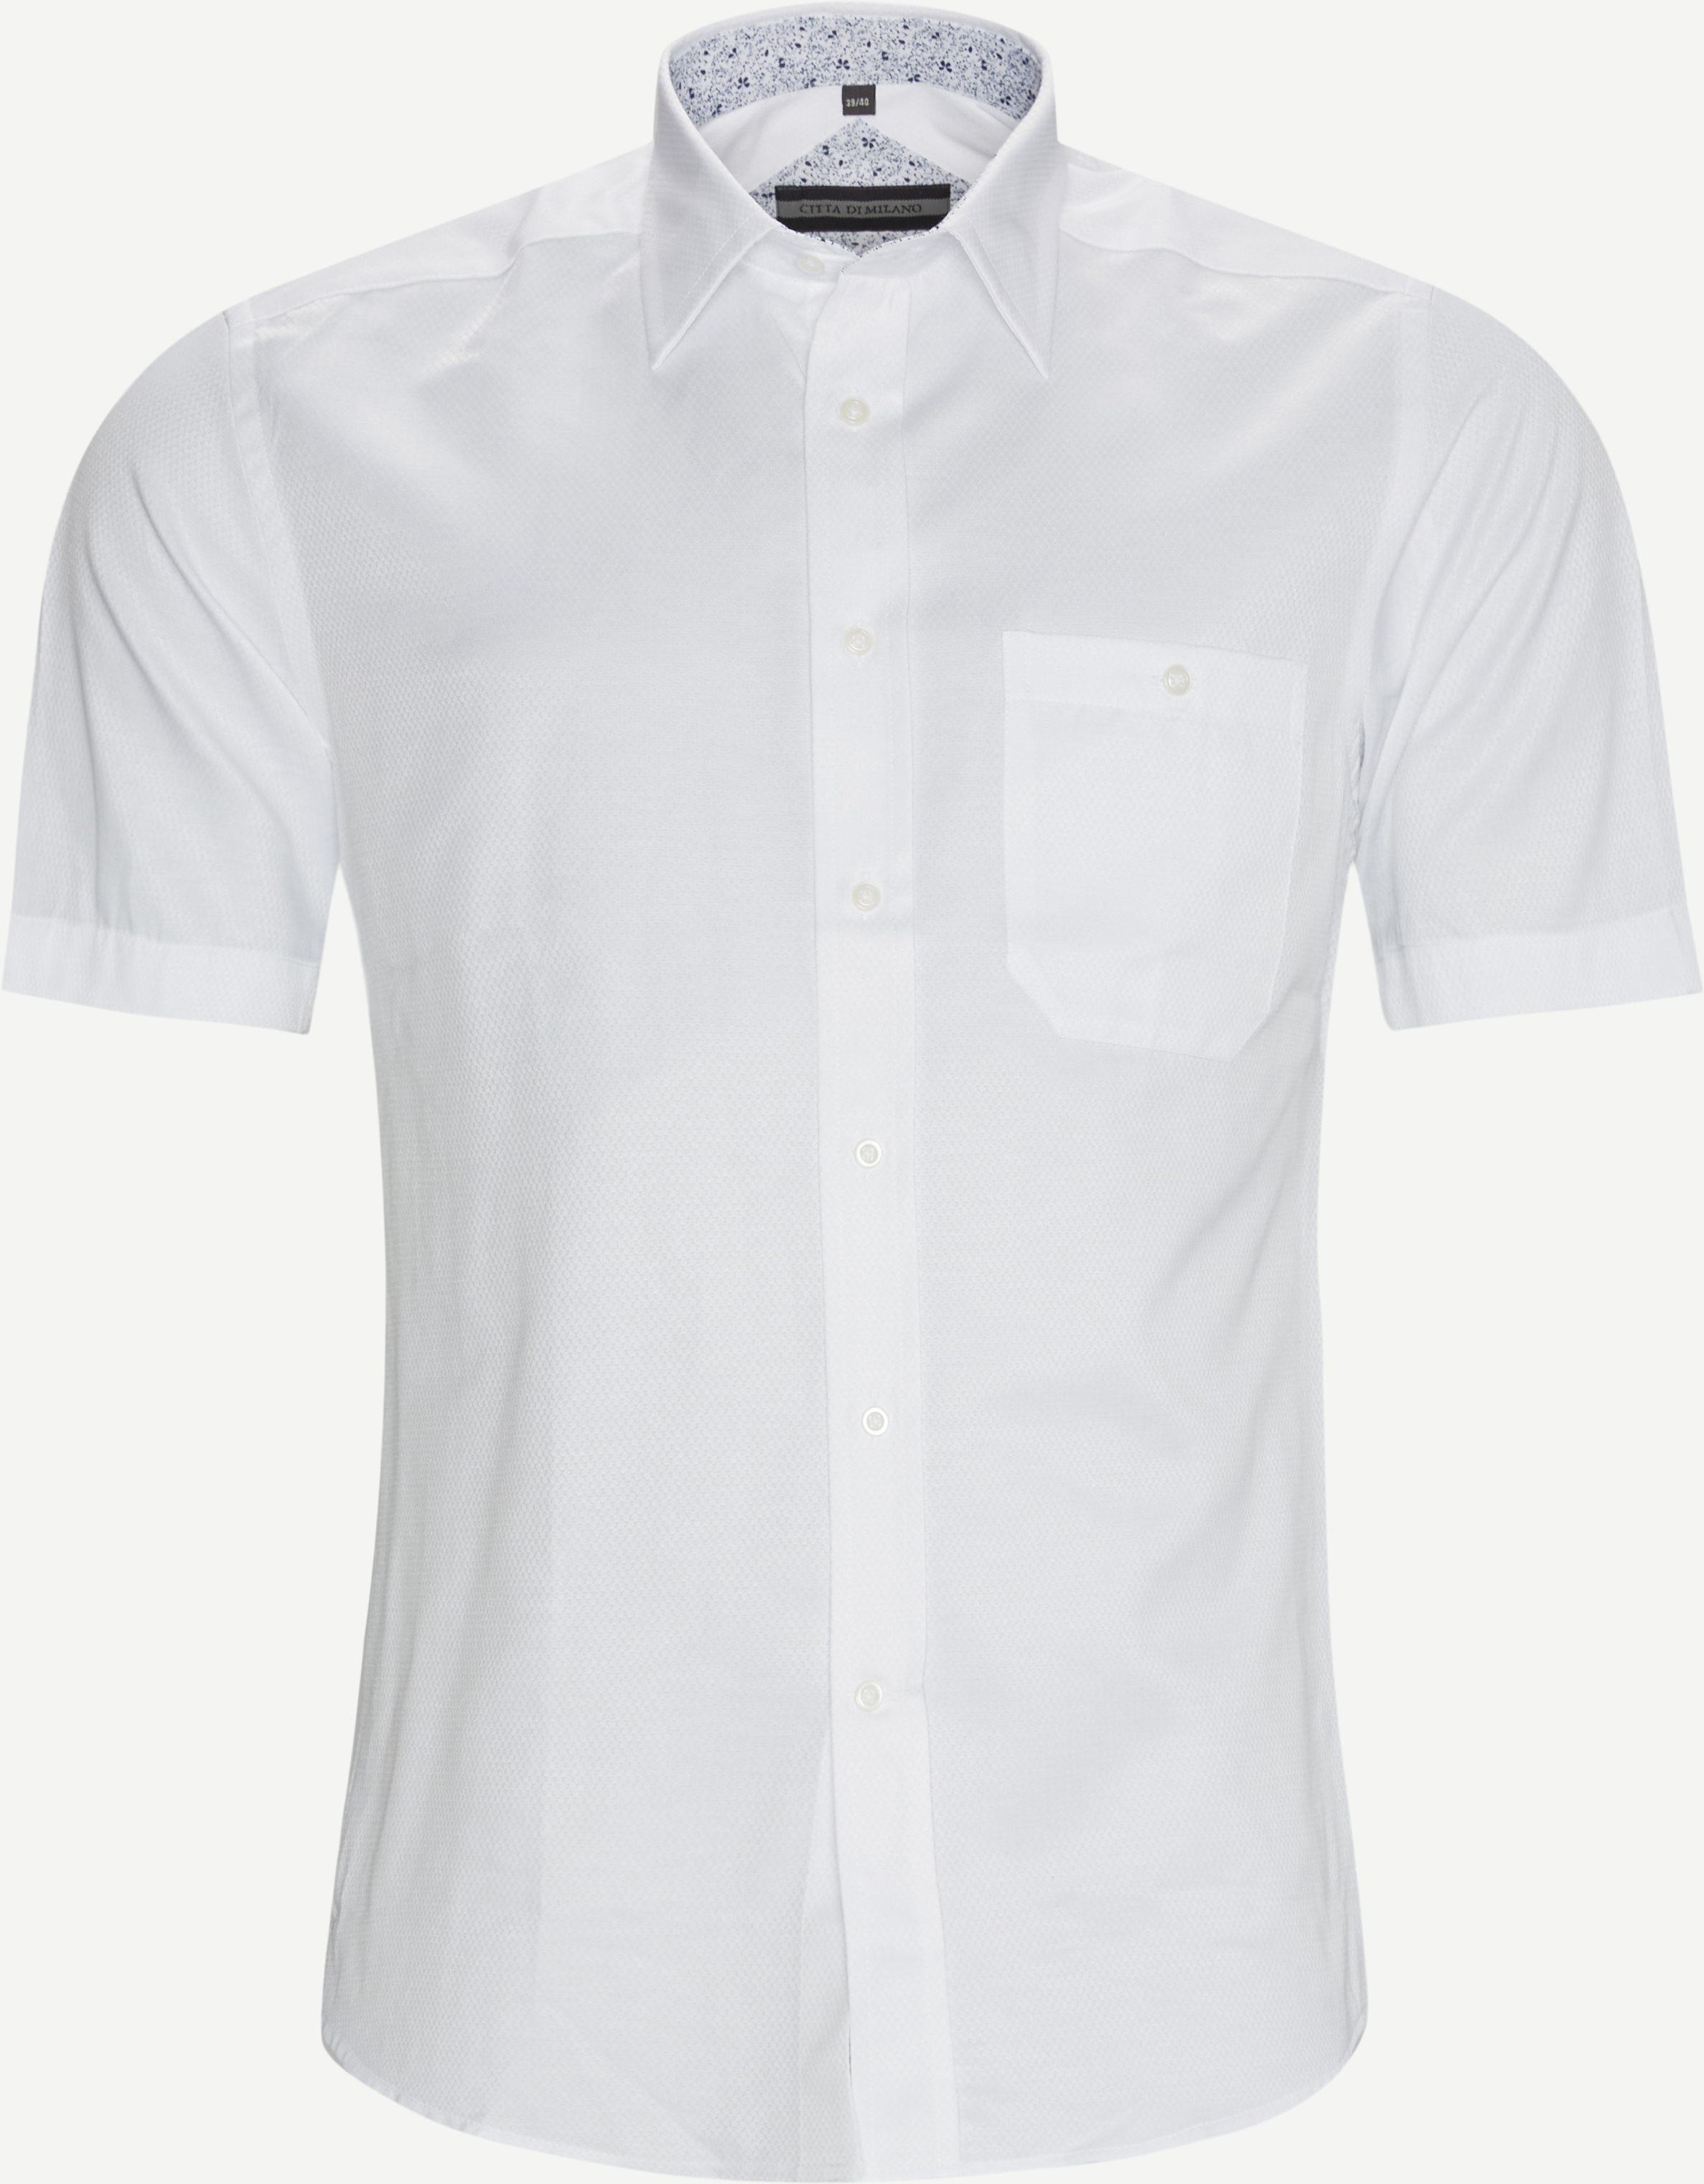 Bergenz K/Æ Skjorte - Kortärmade skjortor - Regular fit - Vit